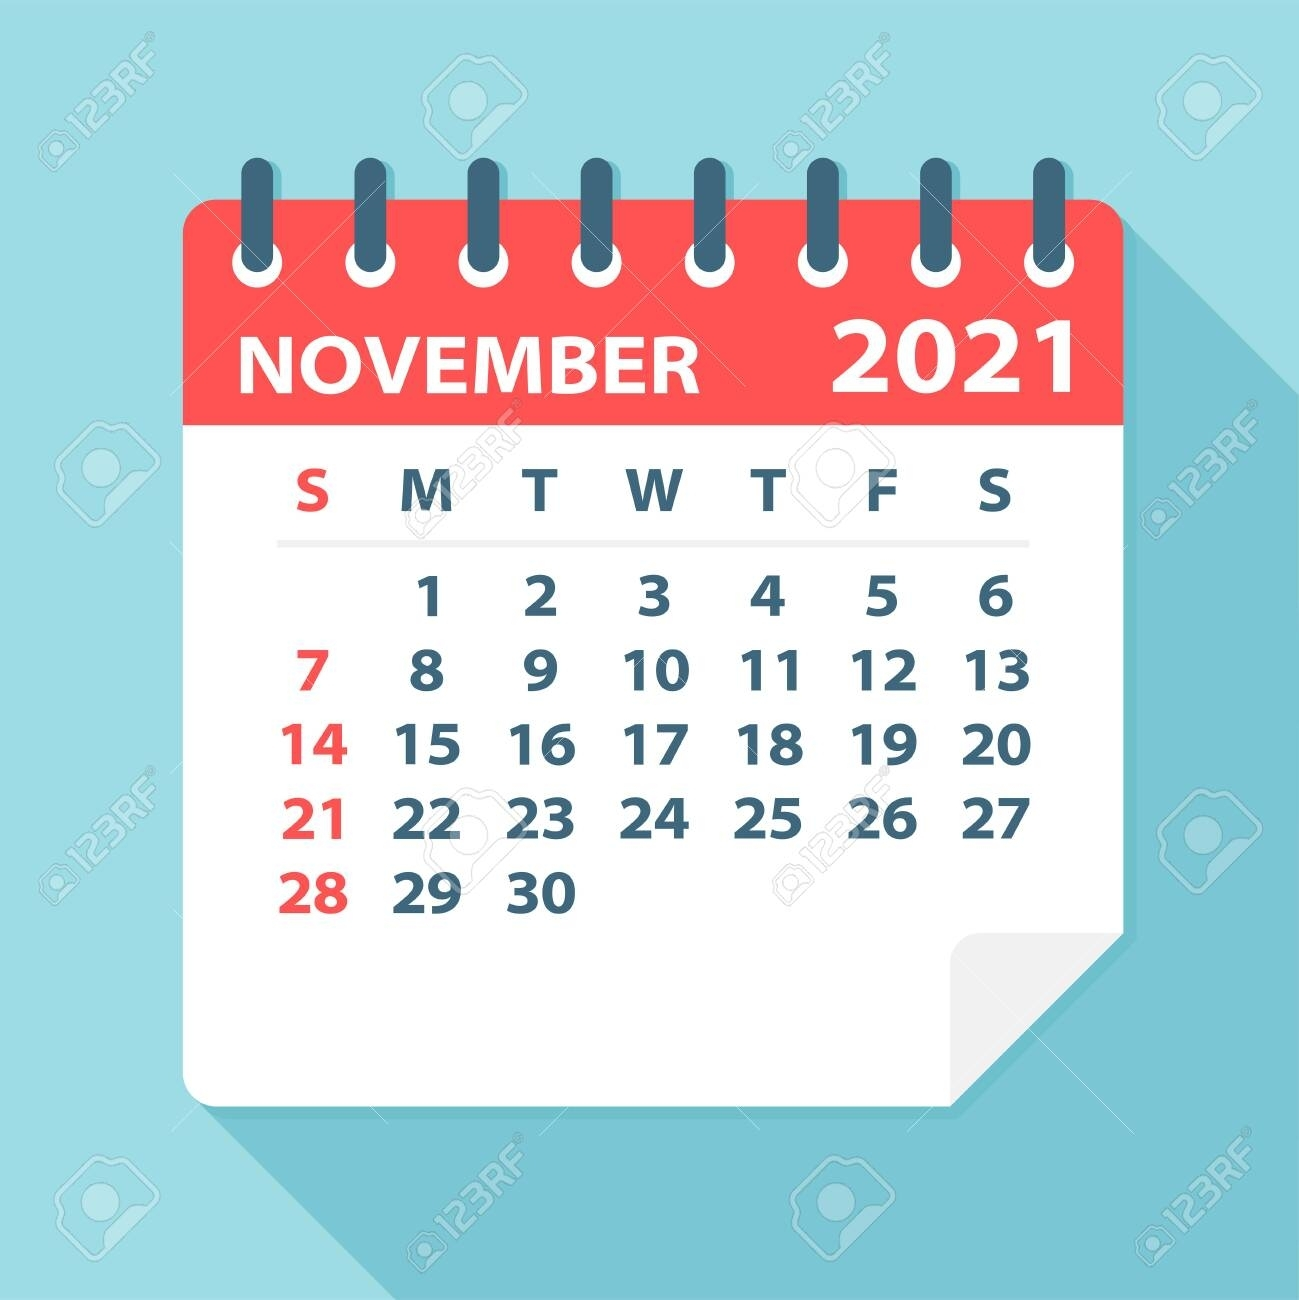 Catch November 2021 Clip Art